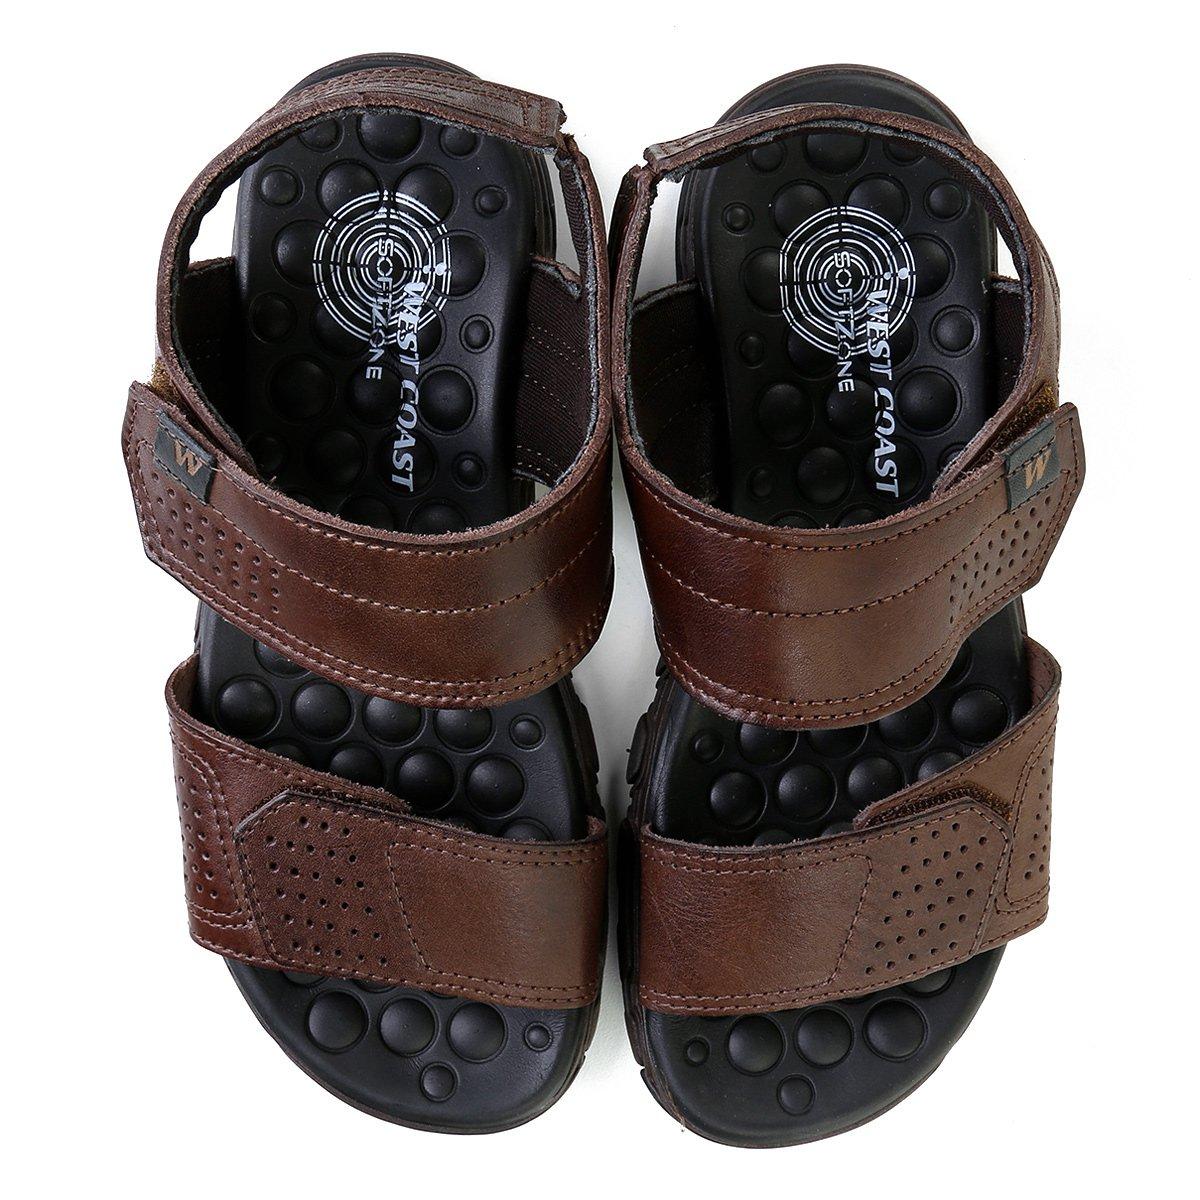 dd0ca6582 Chinelo West Coast Couro Velcro Masculino